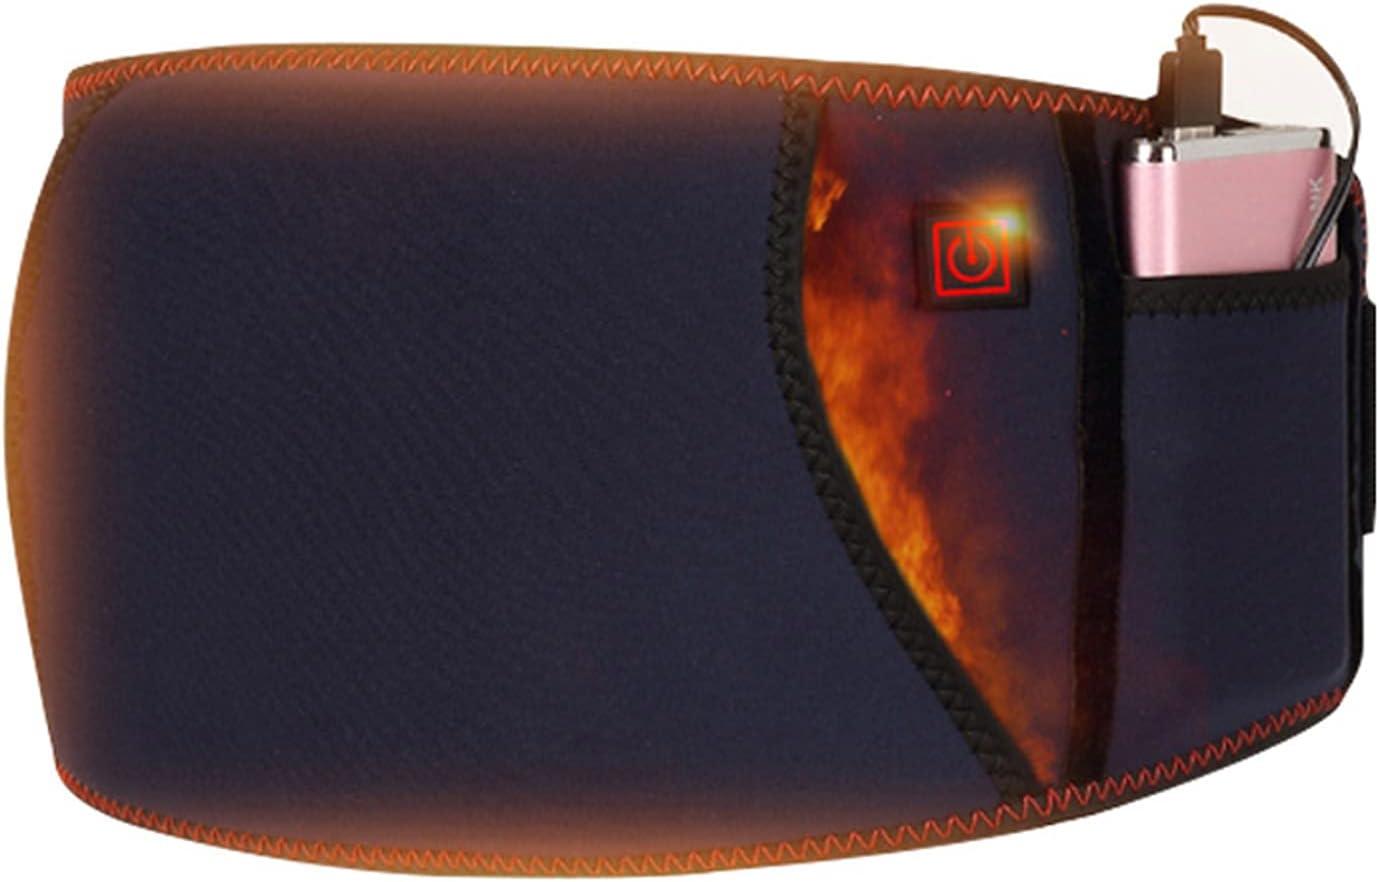 DEG Electric Heated Waist Belt SALENEW very popular Max 48% OFF wrap Heat 3 Fast Heating Pad with